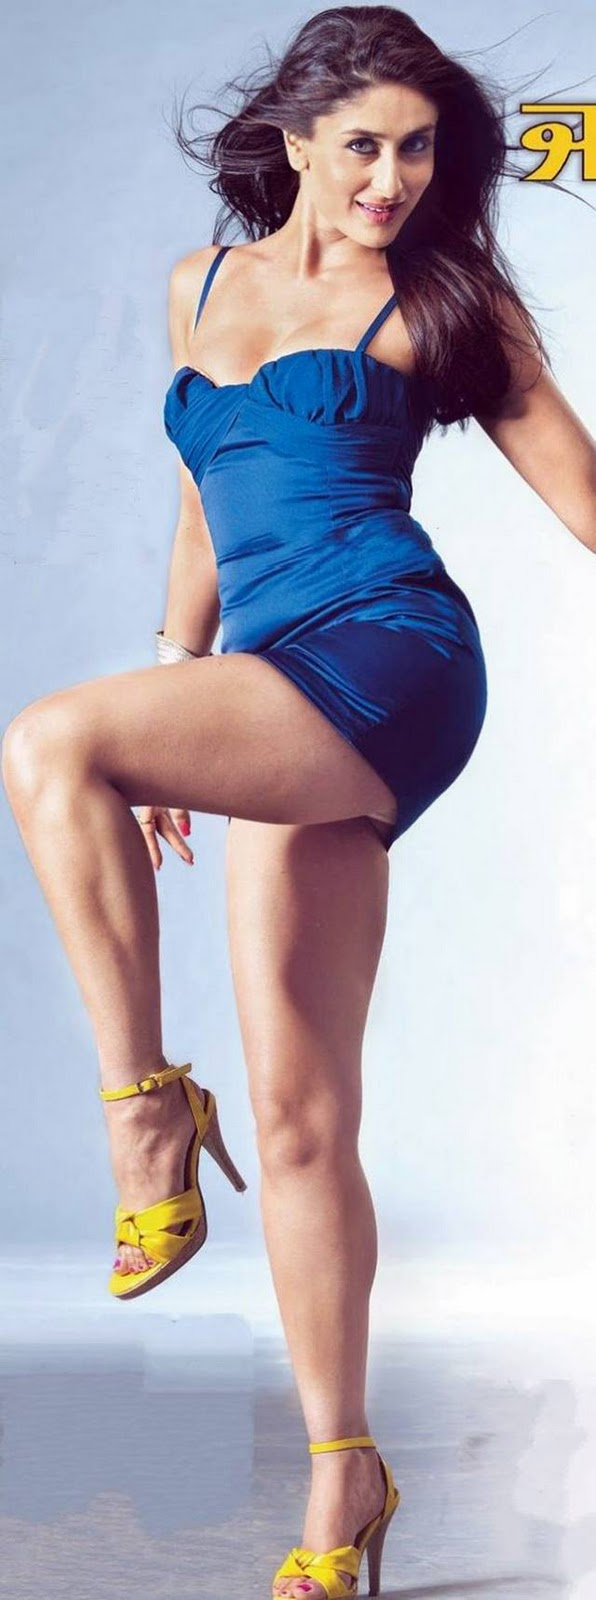 http://3.bp.blogspot.com/-Twc34zR0boQ/TndEI4wLpQI/AAAAAAAAjME/BytIVP2xtIE/s1600/01+Kareen+Kapoor+Legs.jpg